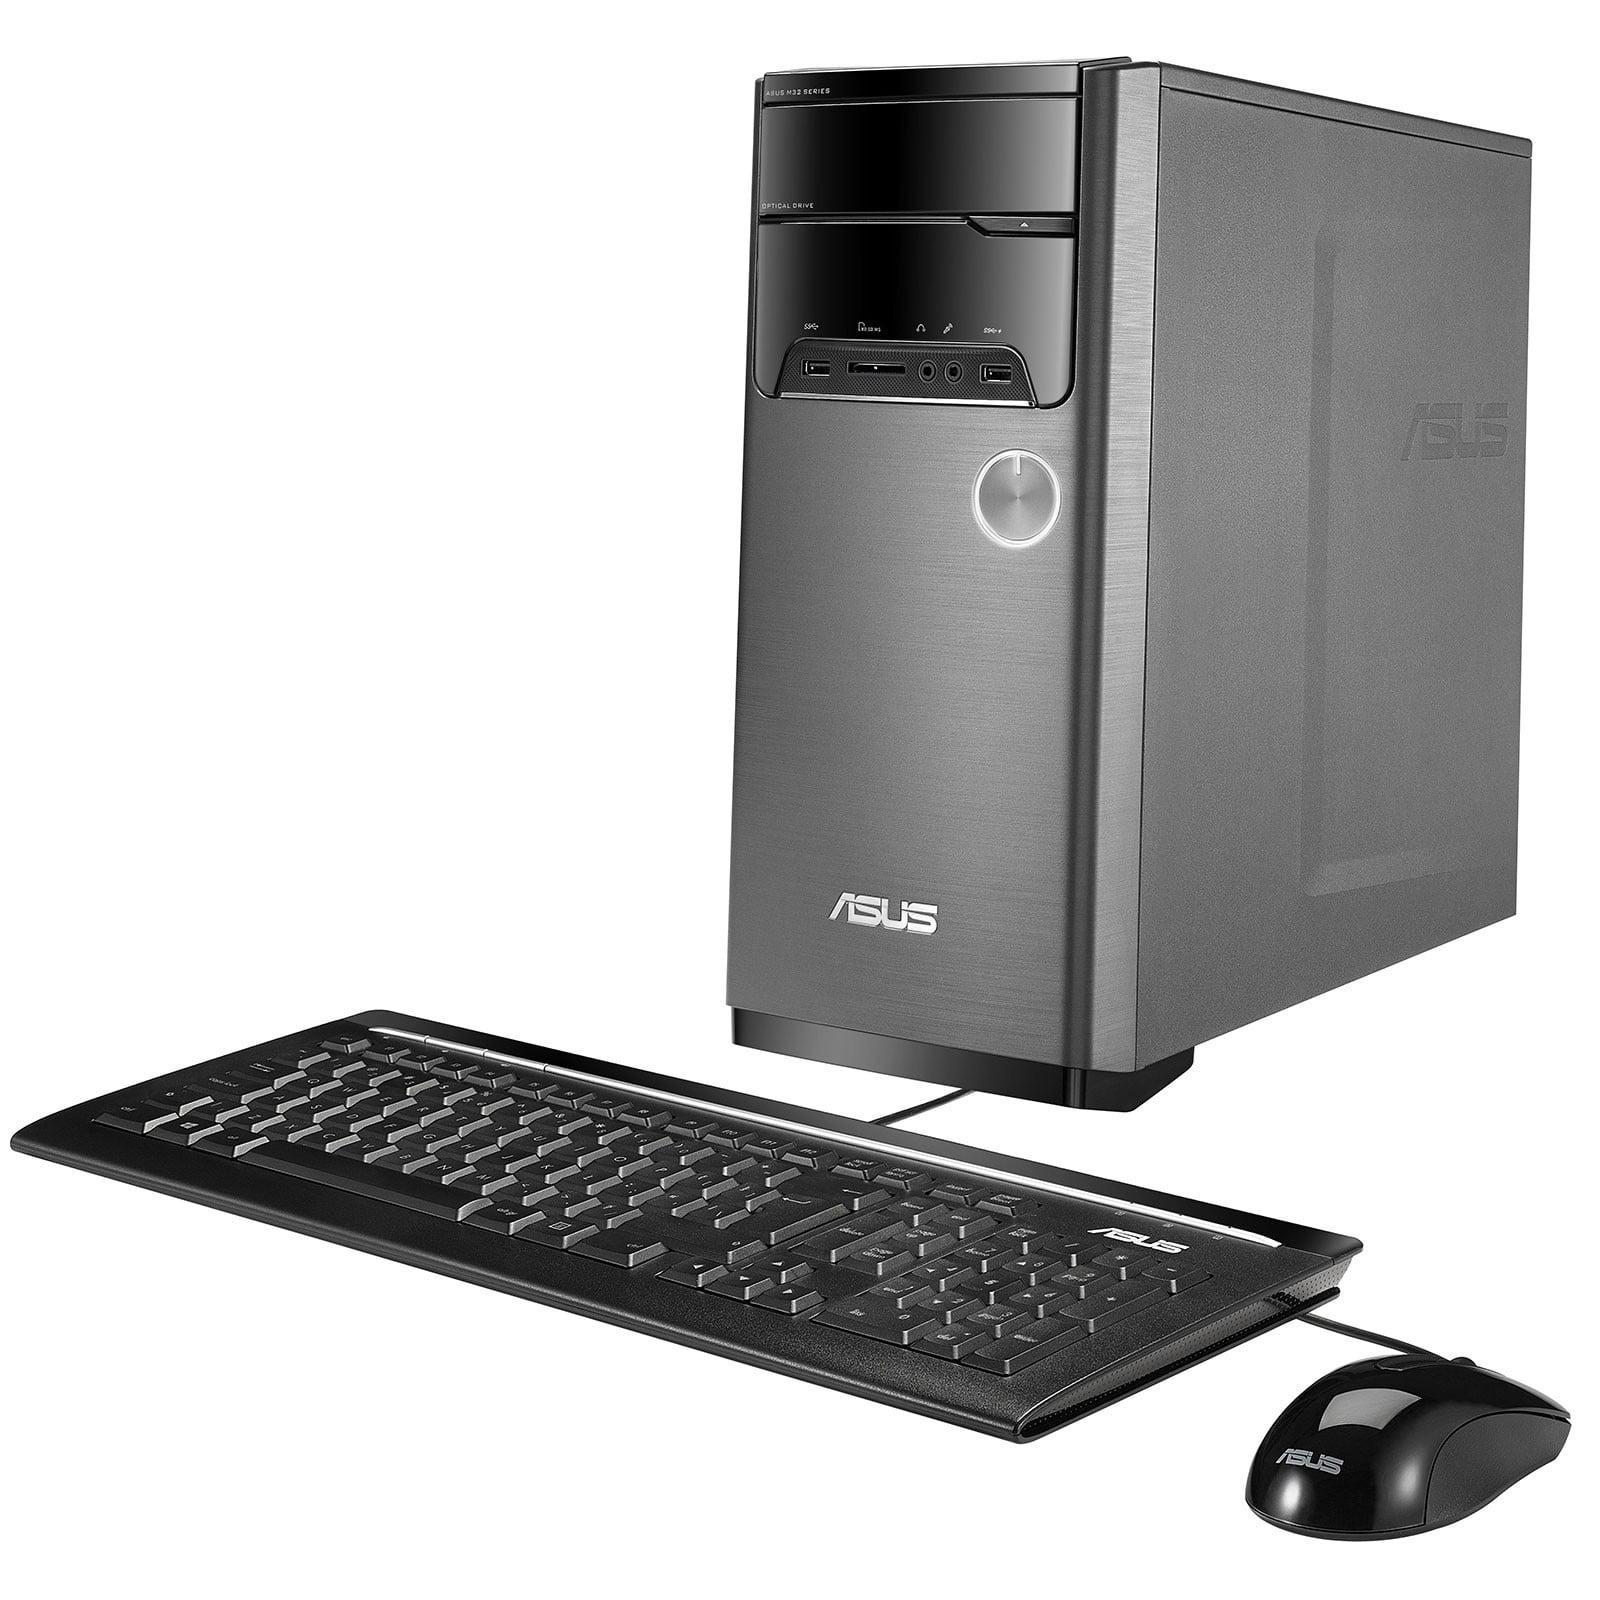 ASUS VivoPC M32CD Desktop, Intel Quad-Core i5-7400 Upto 3.5GHz, 32GB DDR4, 1TB SSD Plus 1TB HDD, NVIDIA GeForce GT 730... by ASUS